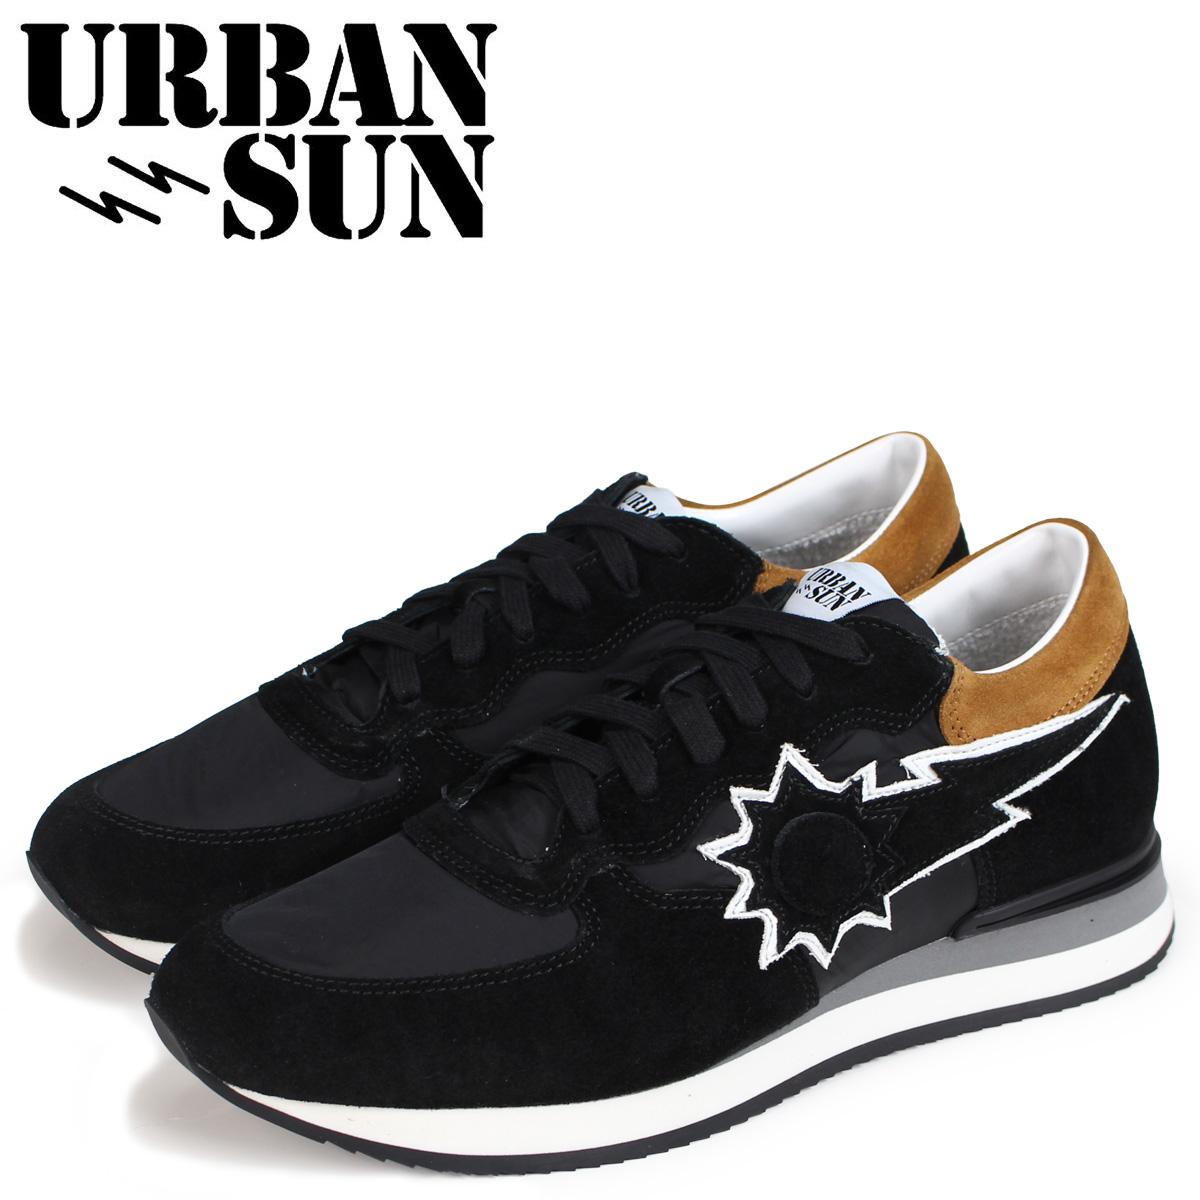 URBAN SUN アーバンサン アレイン スニーカー メンズ ALAIN ブラック 黒